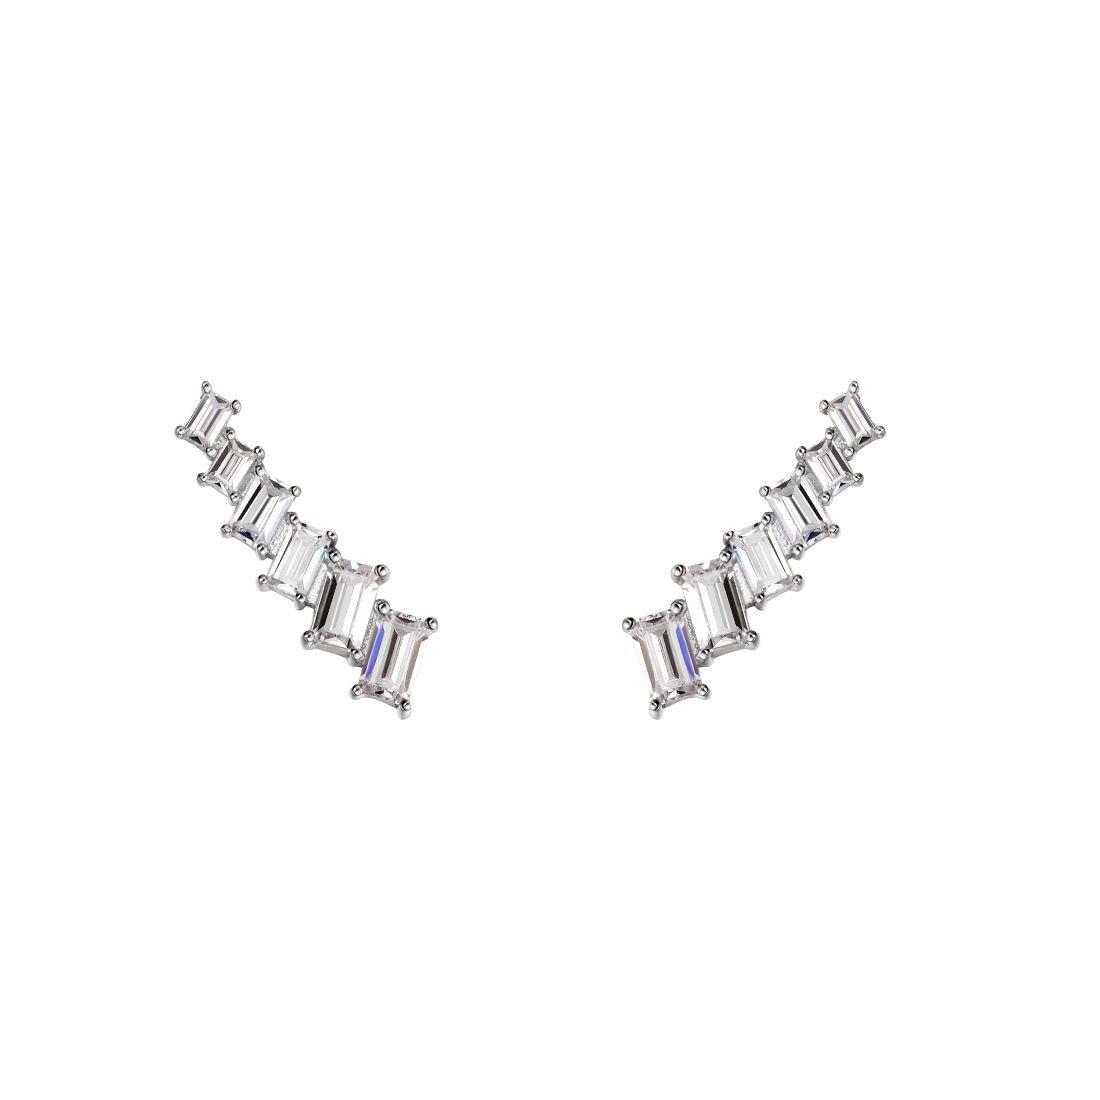 Carleen 925 Sterling Silver CZ Cubic Zirconia Cuff Earrings Ear Crawler Climber Jackets For Women Girls by Carleen